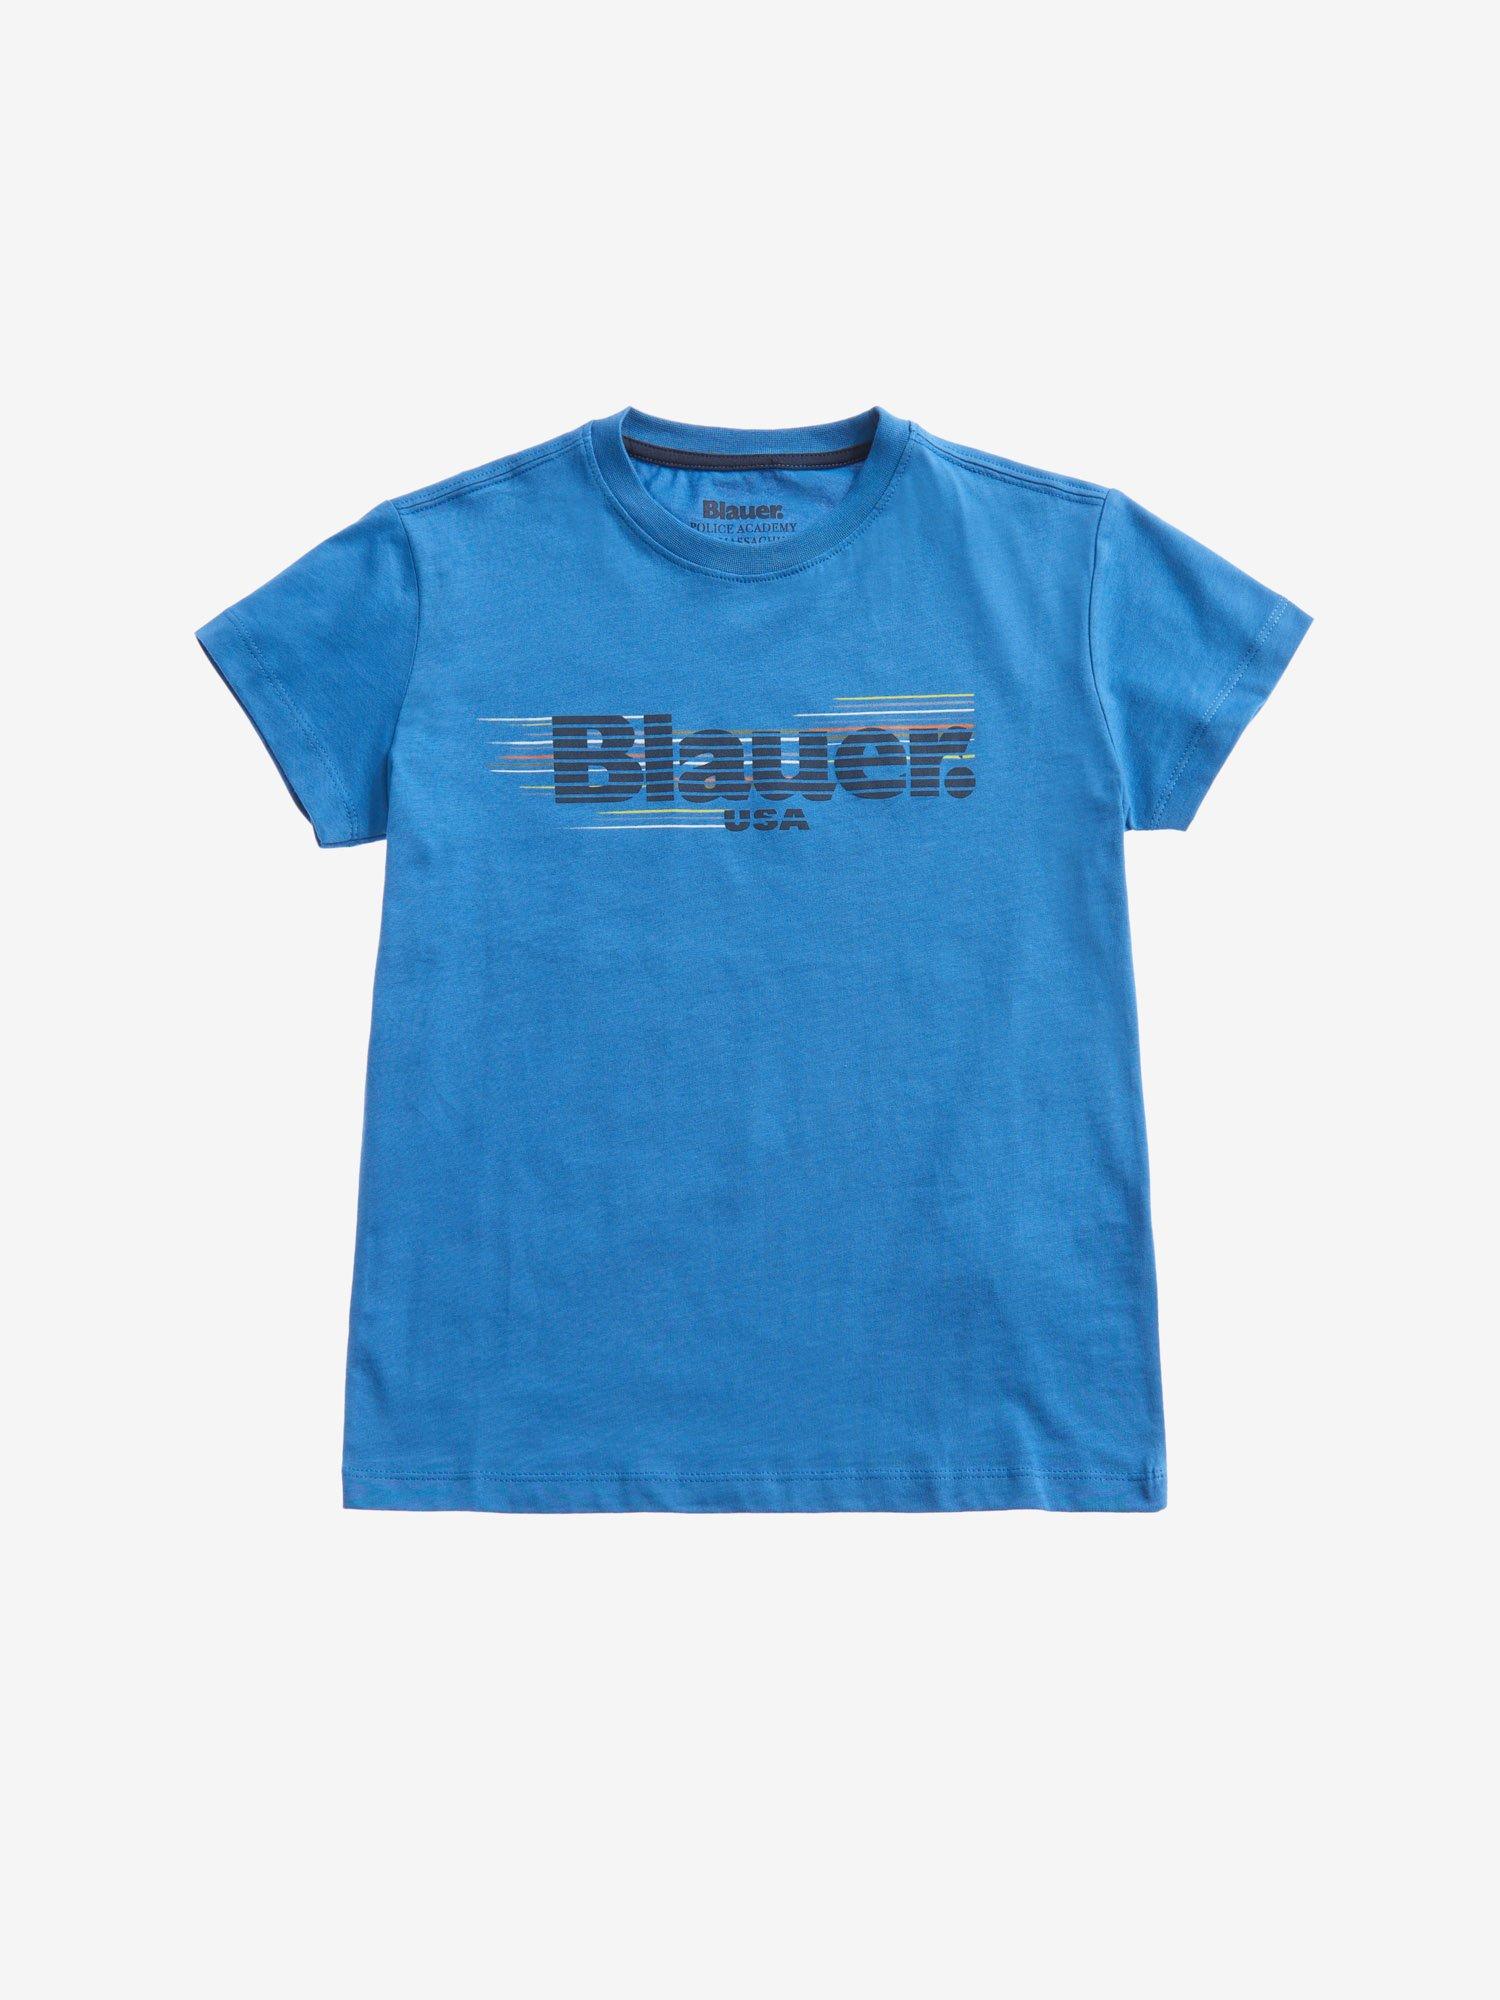 CAMISETA NIÑO RAYADA BLAUER - Blauer